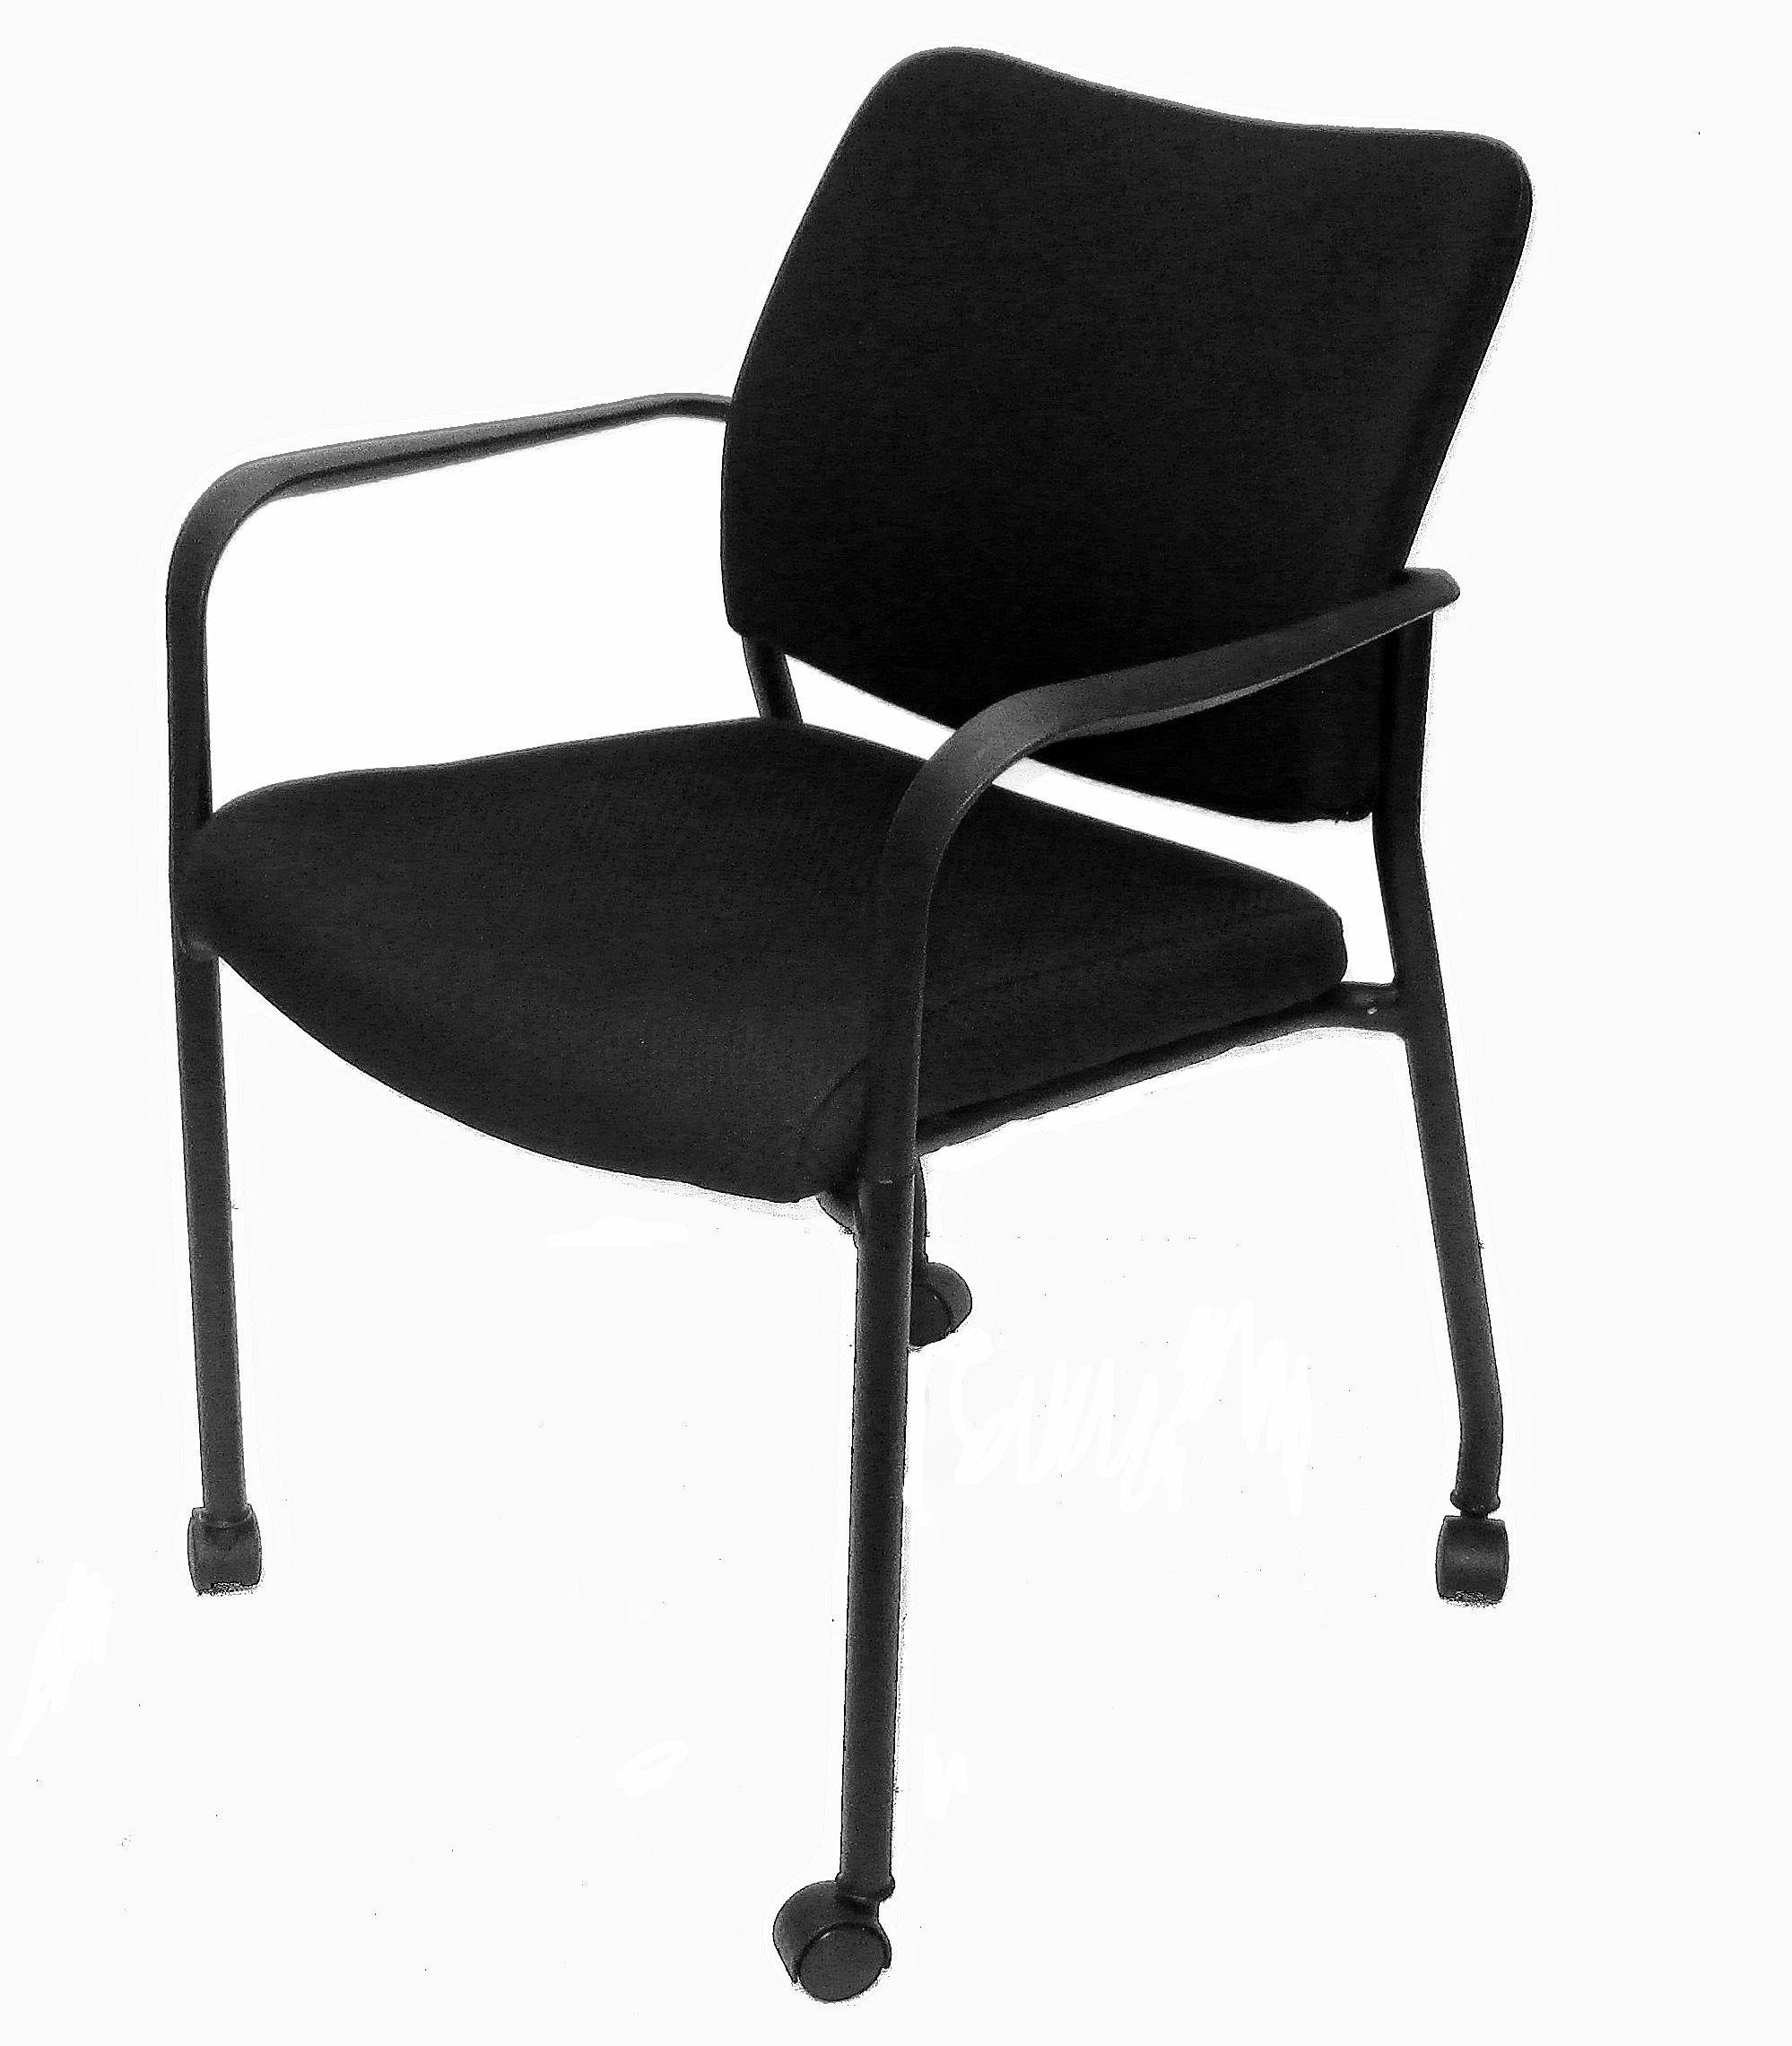 Wartezimmer Stühle Bequemen Bürostuhl Büro Stuhl Design ...